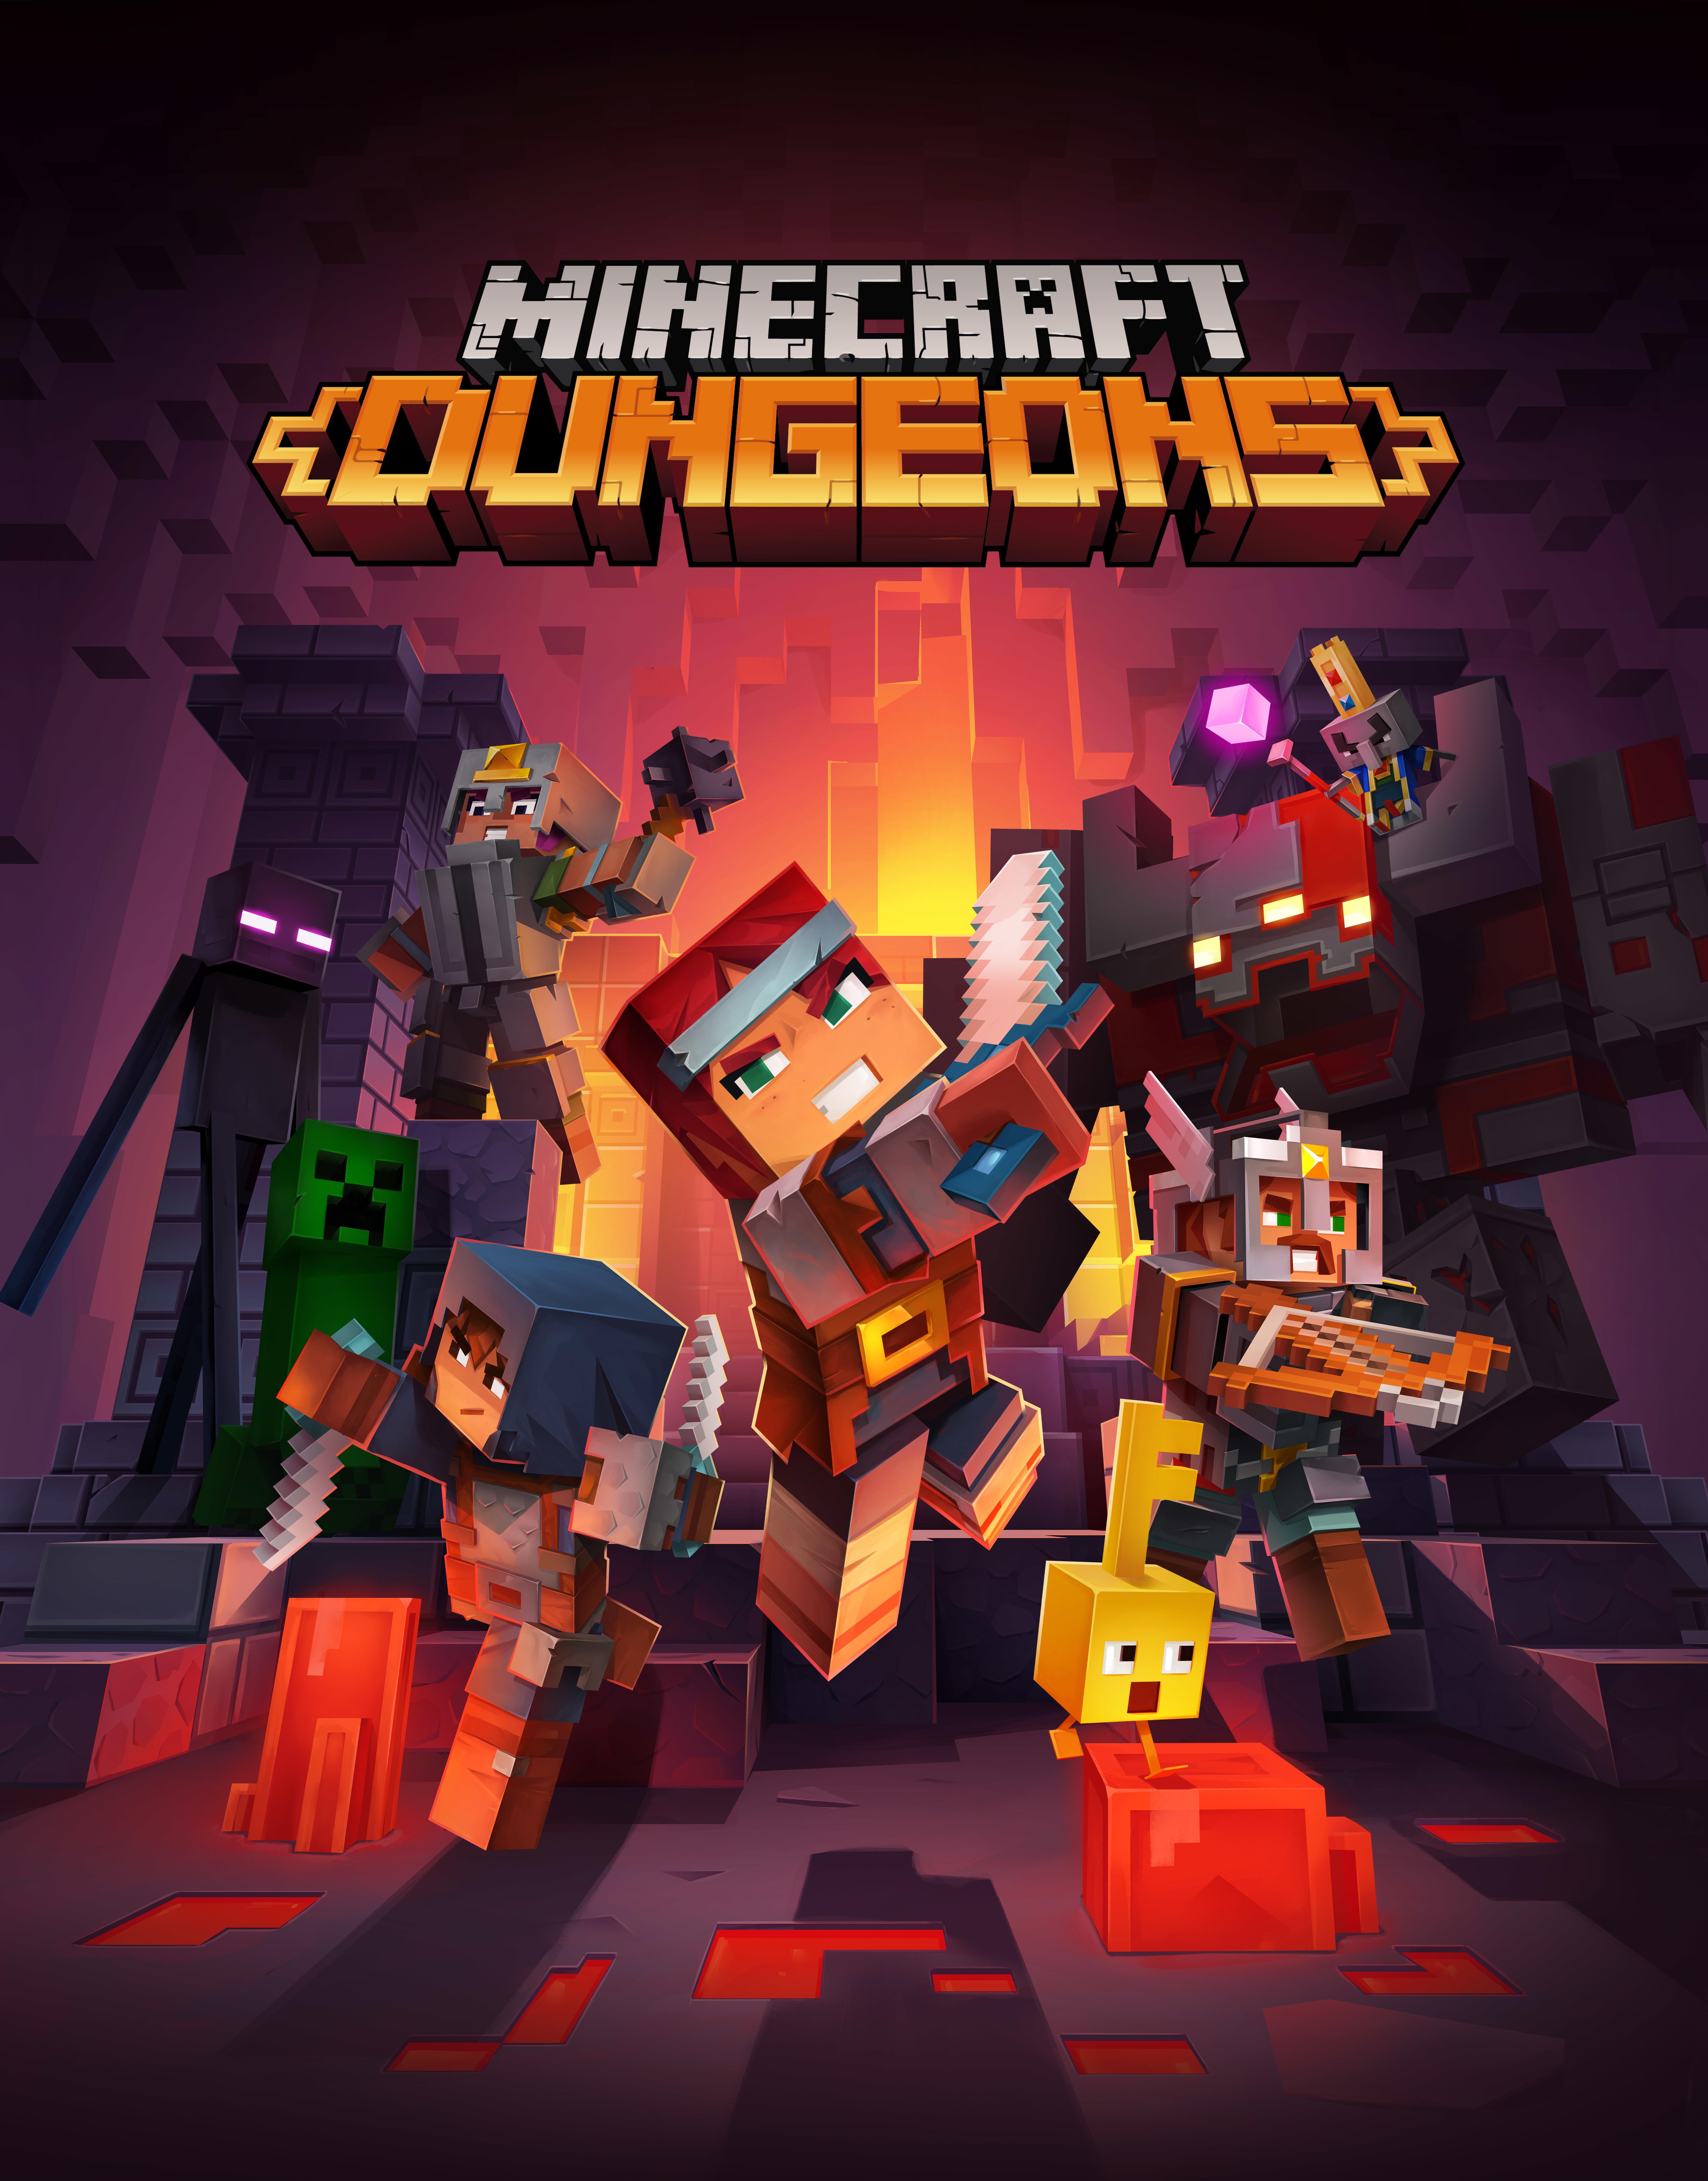 minecraft dungeons a2ppaG6UmZqaraWkpJRram1lrW1pZWU